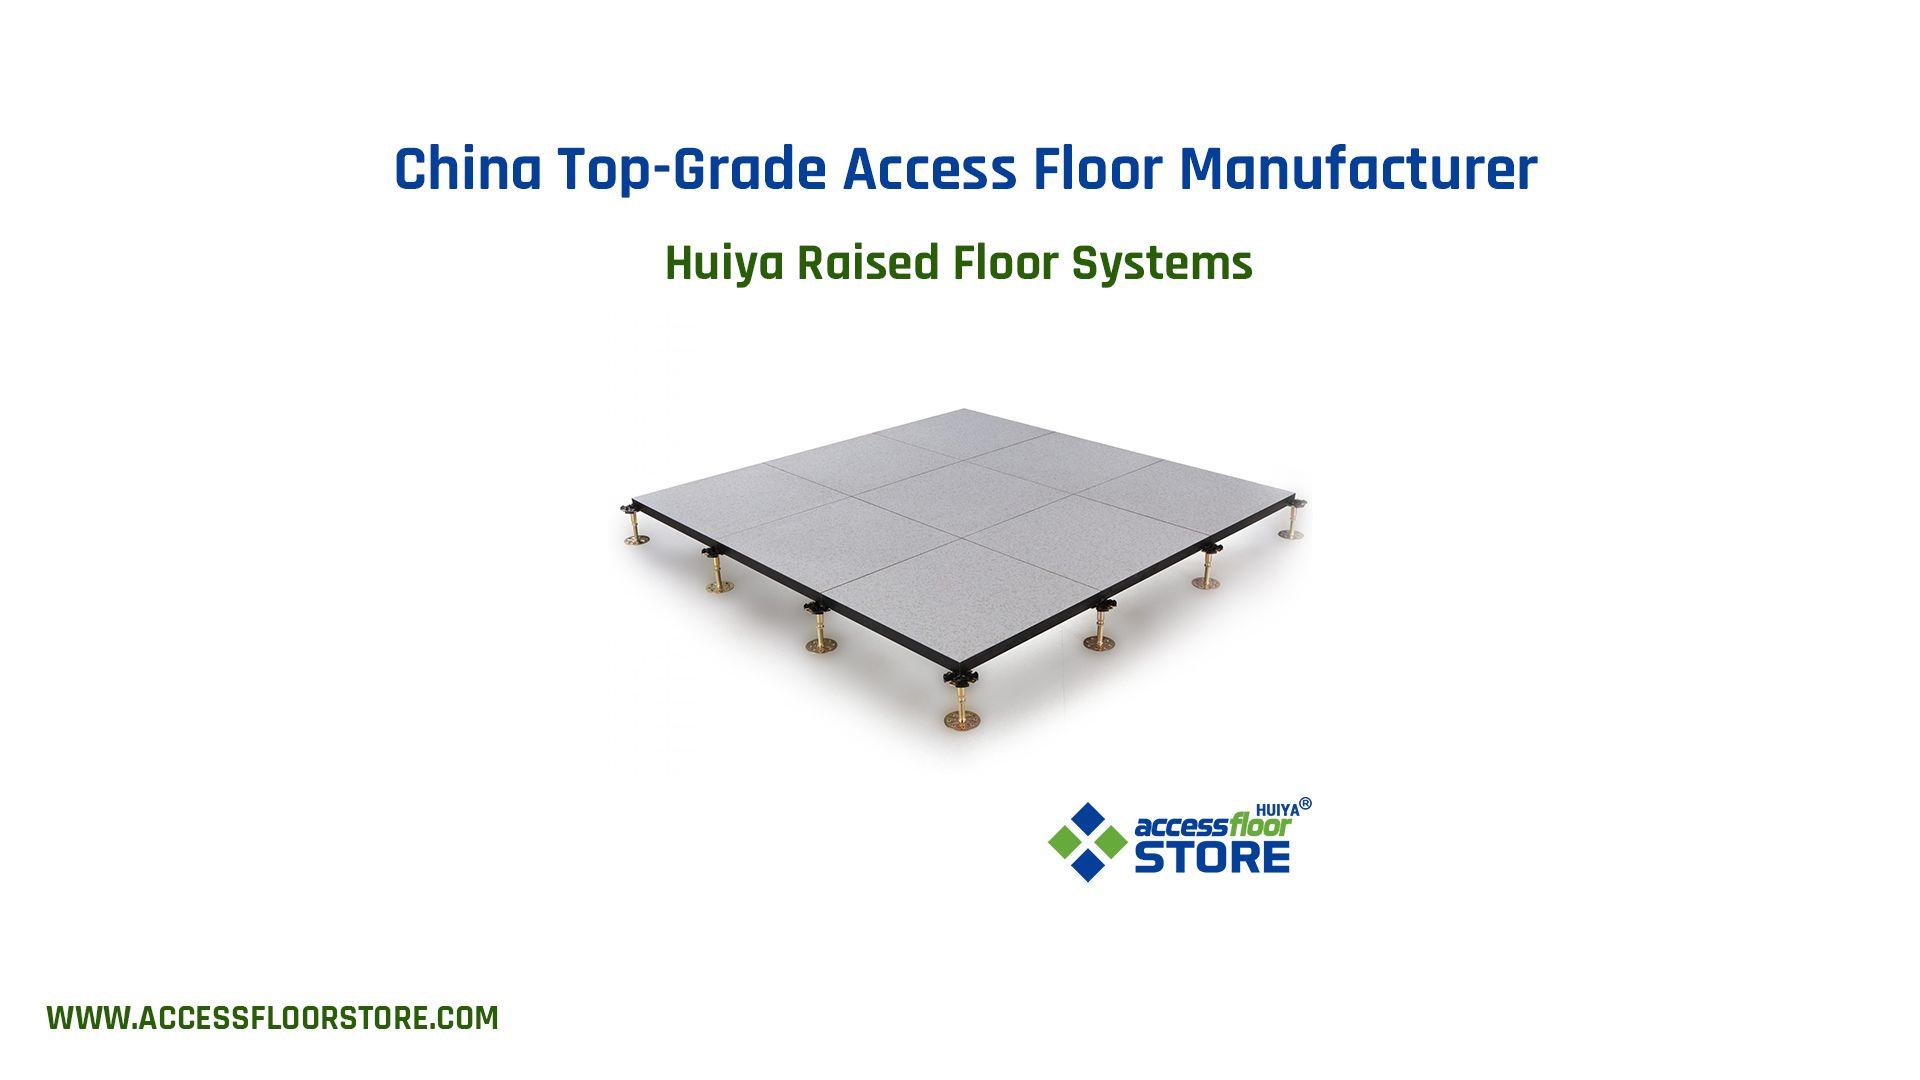 Huiya Raised Floor System Is The Ideal Flooring Solution For Data